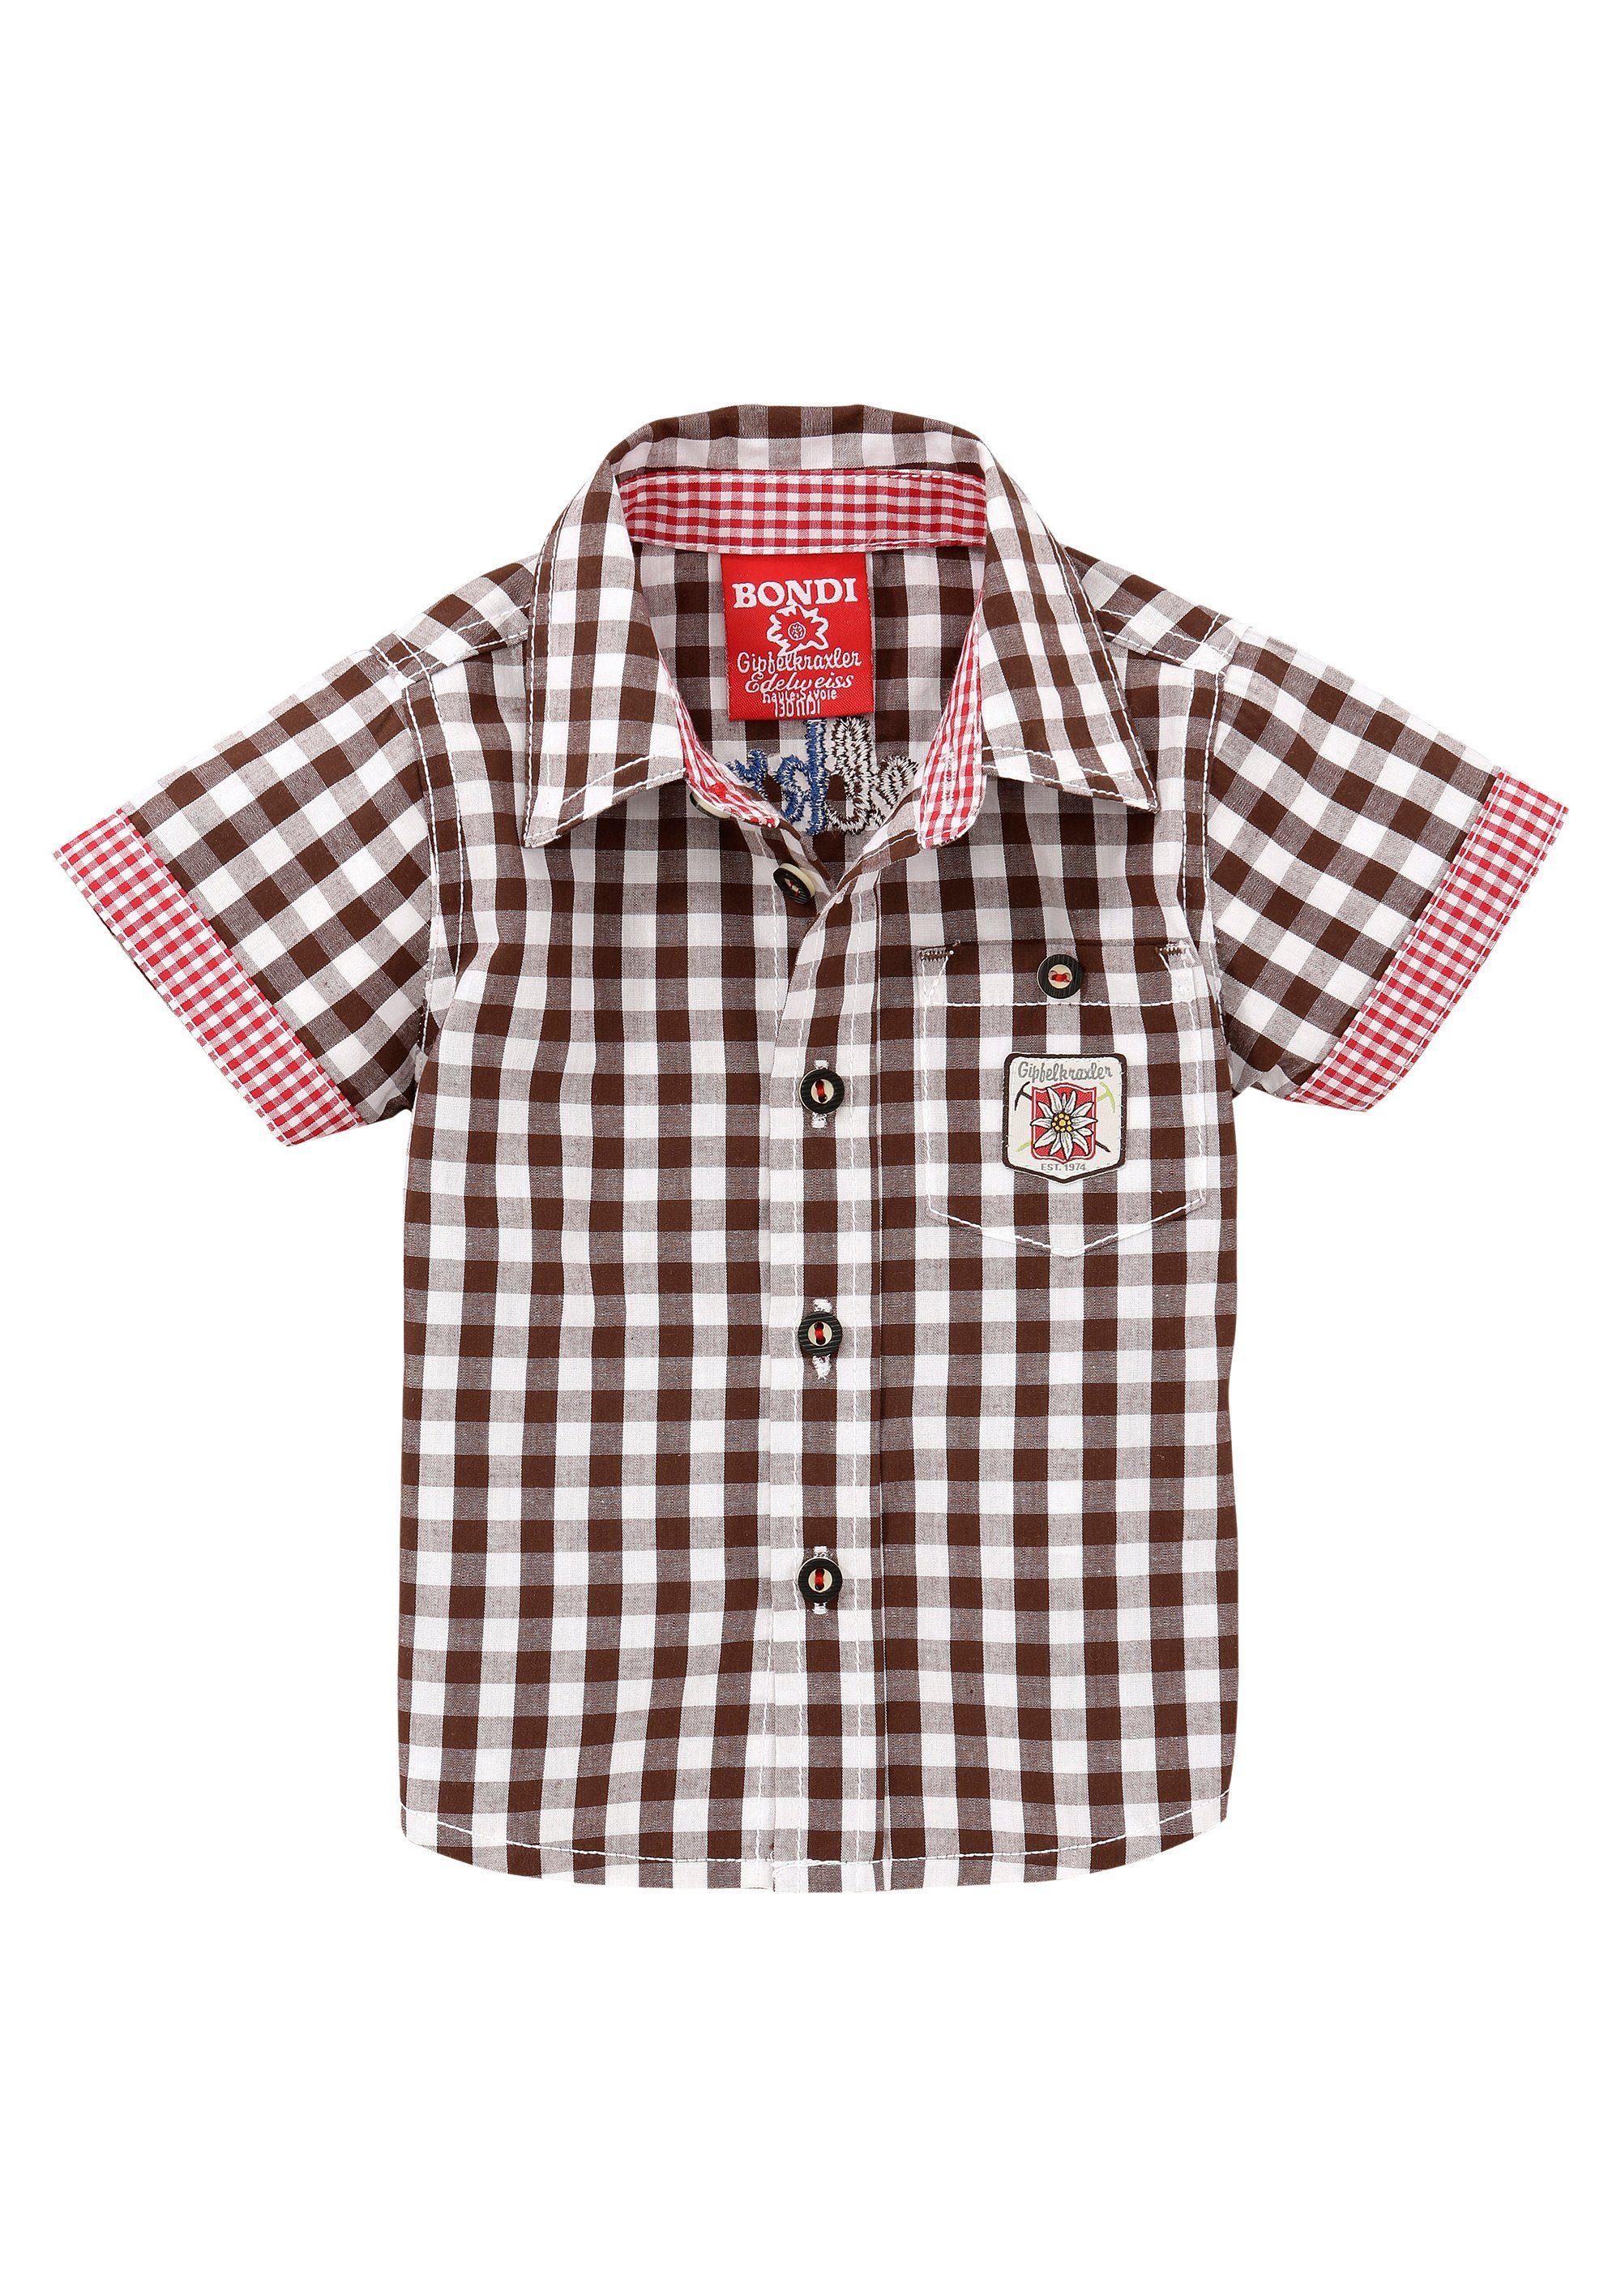 Herren BONDI Trachtenhemd mit Stickerei braun   04042034438516